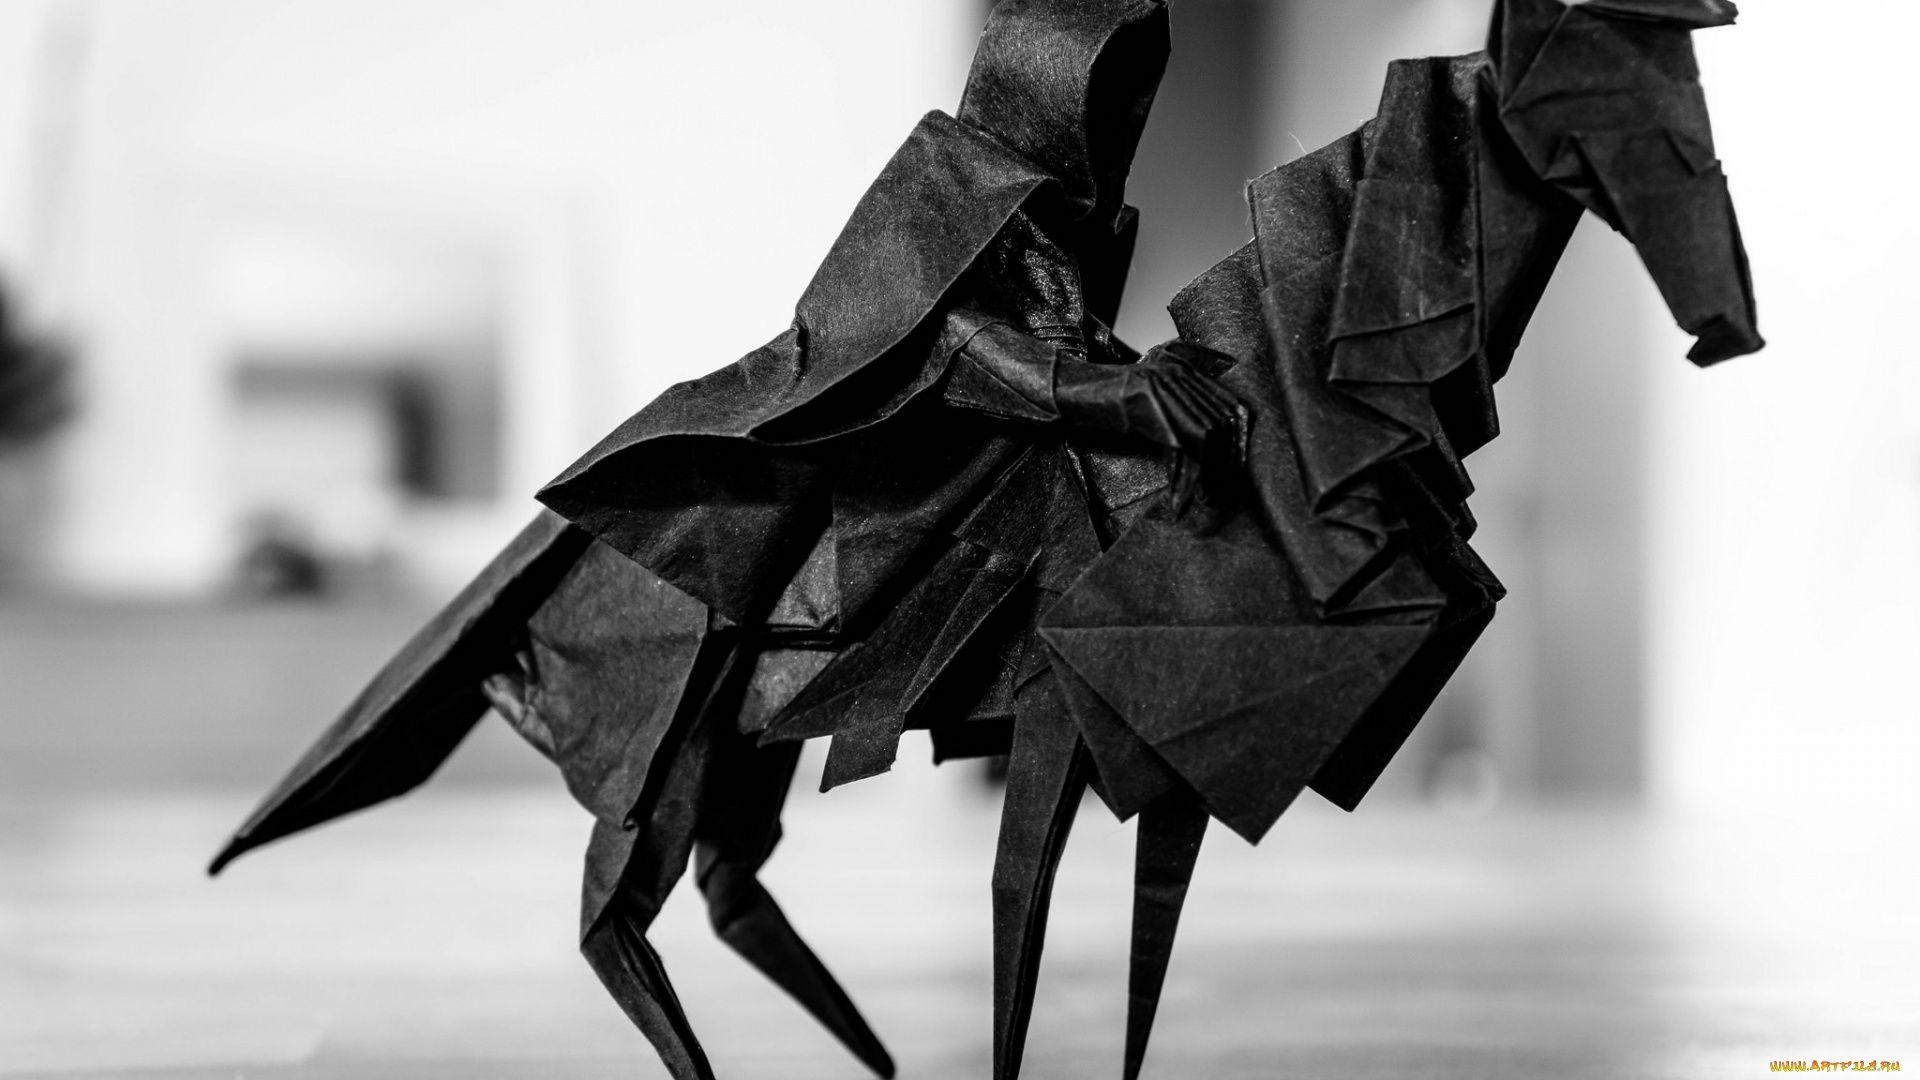 Origami 1080p background